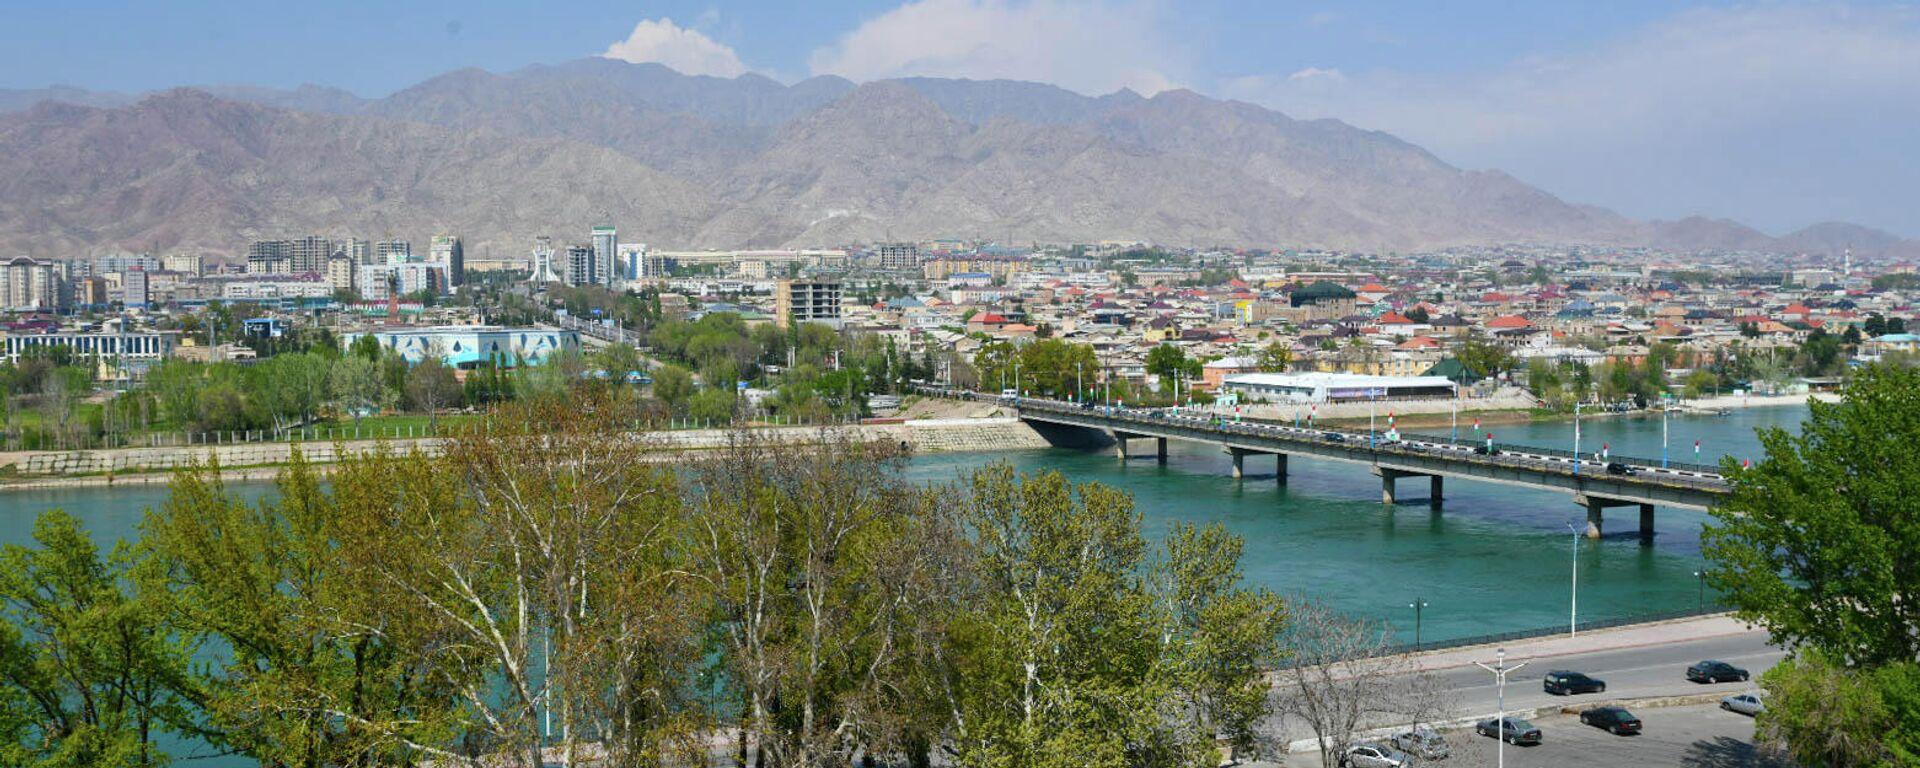 Панорама города Худжанд - Sputnik Таджикистан, 1920, 28.07.2021